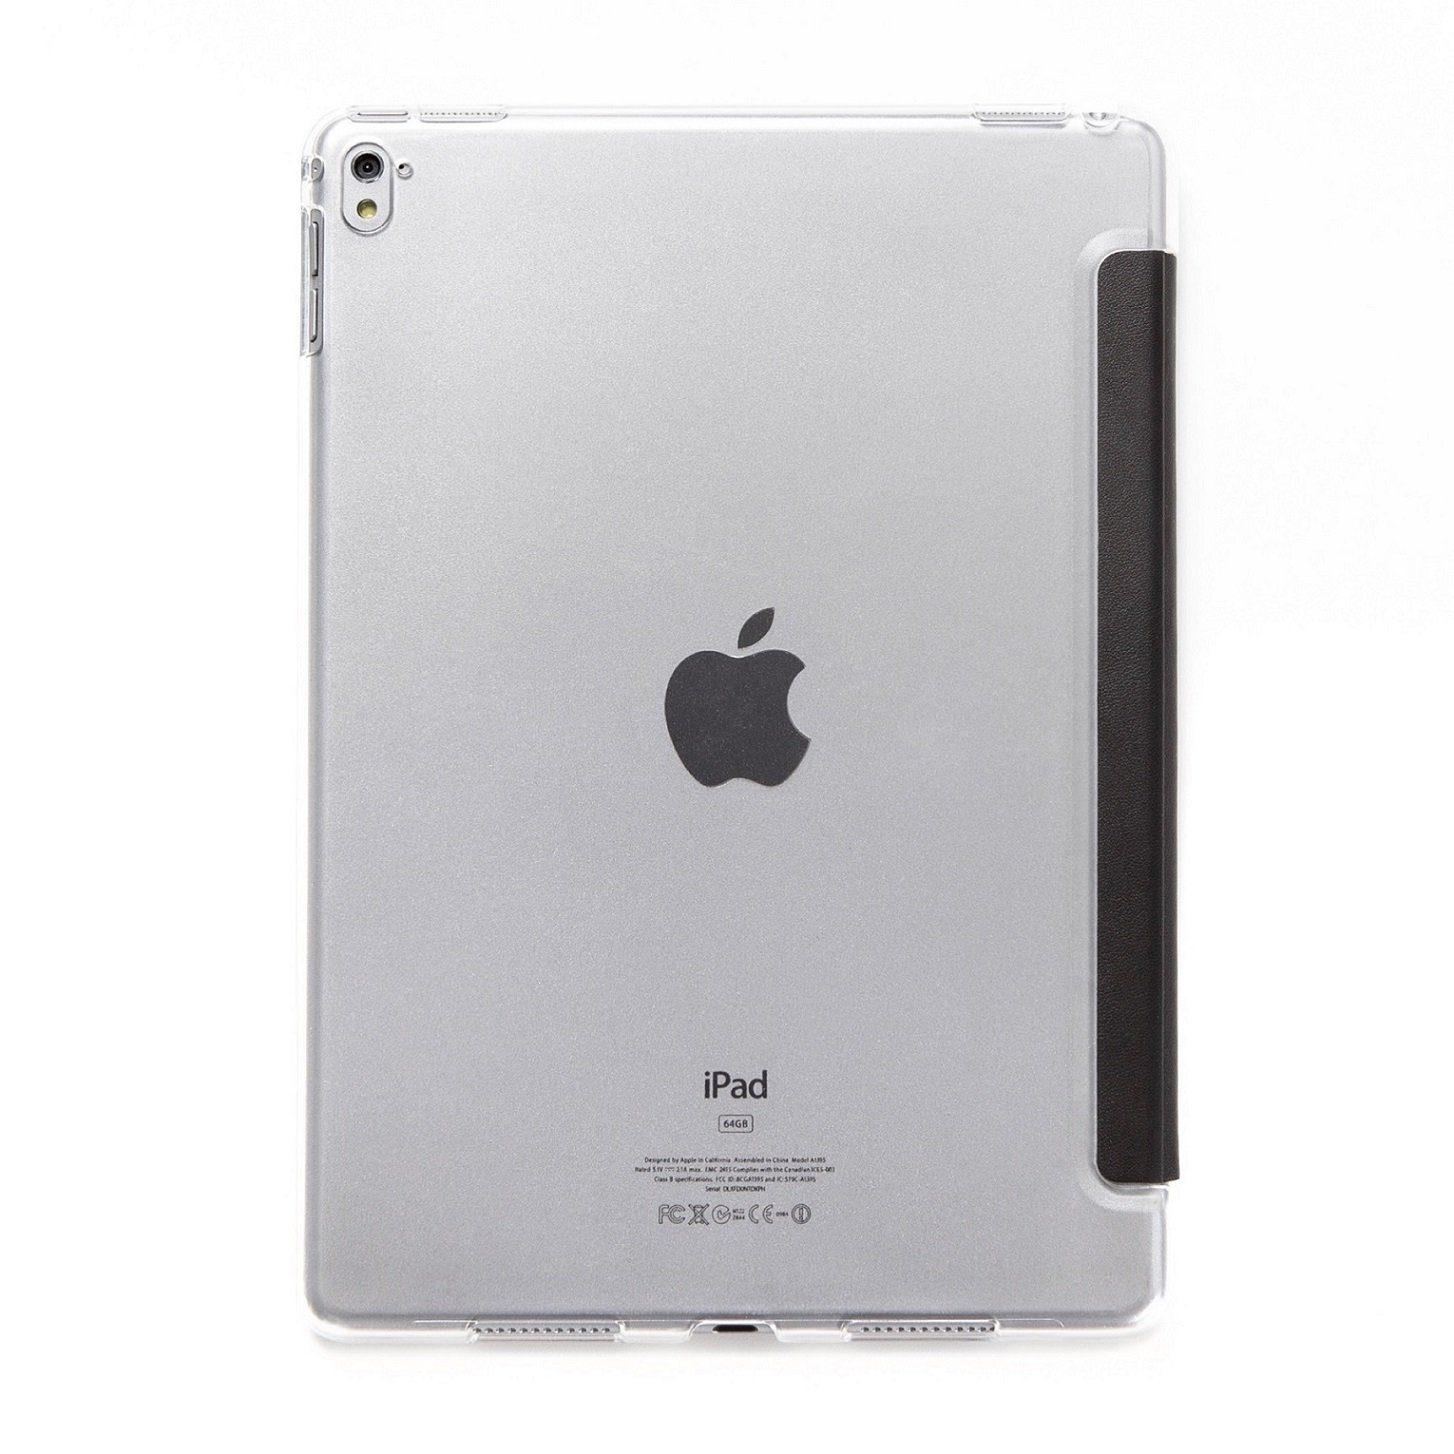 "Woodcessories EcoGuard - Echtholz Case für iPad Pro 9,7"" - Tackleberry"